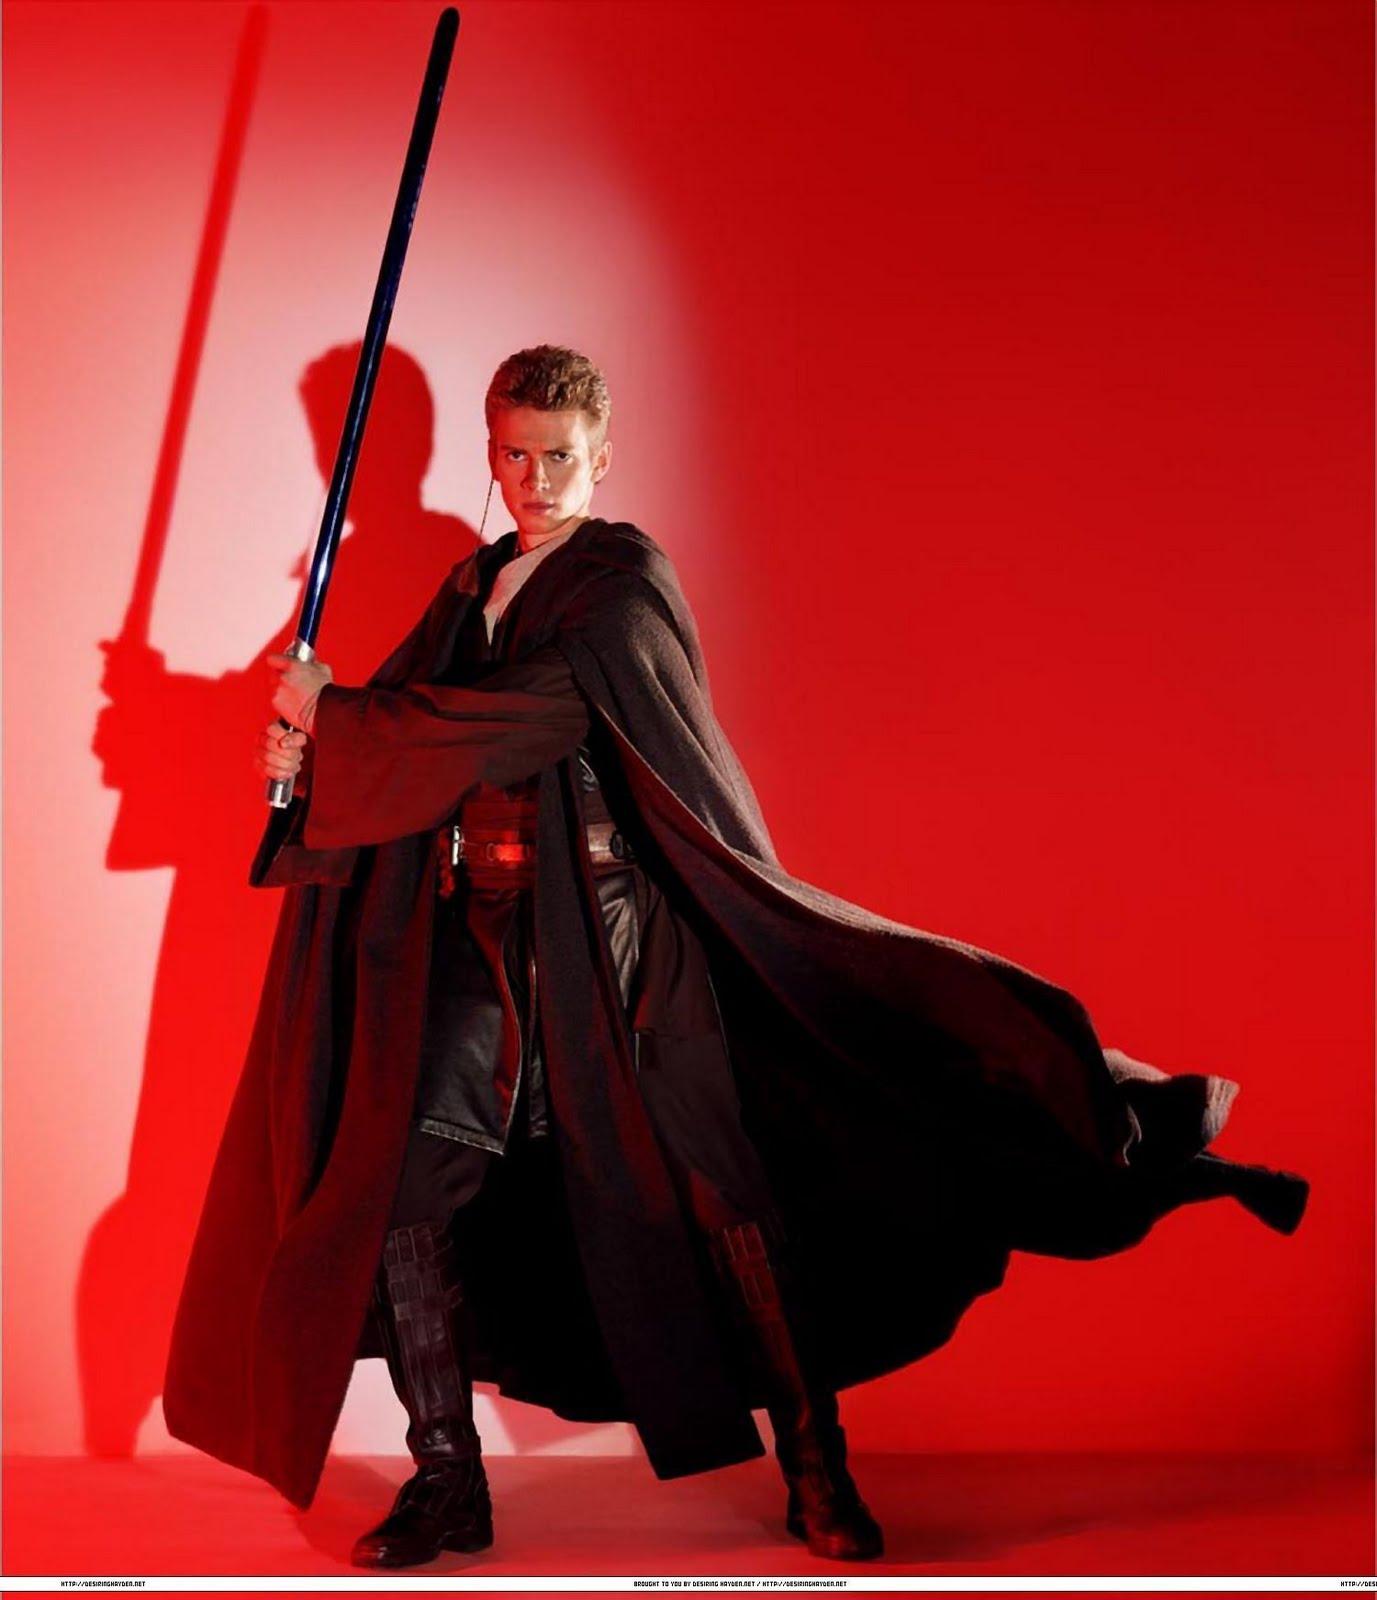 Free Download Star Wars Episode 3 Anakin Skywalker Wallpaper